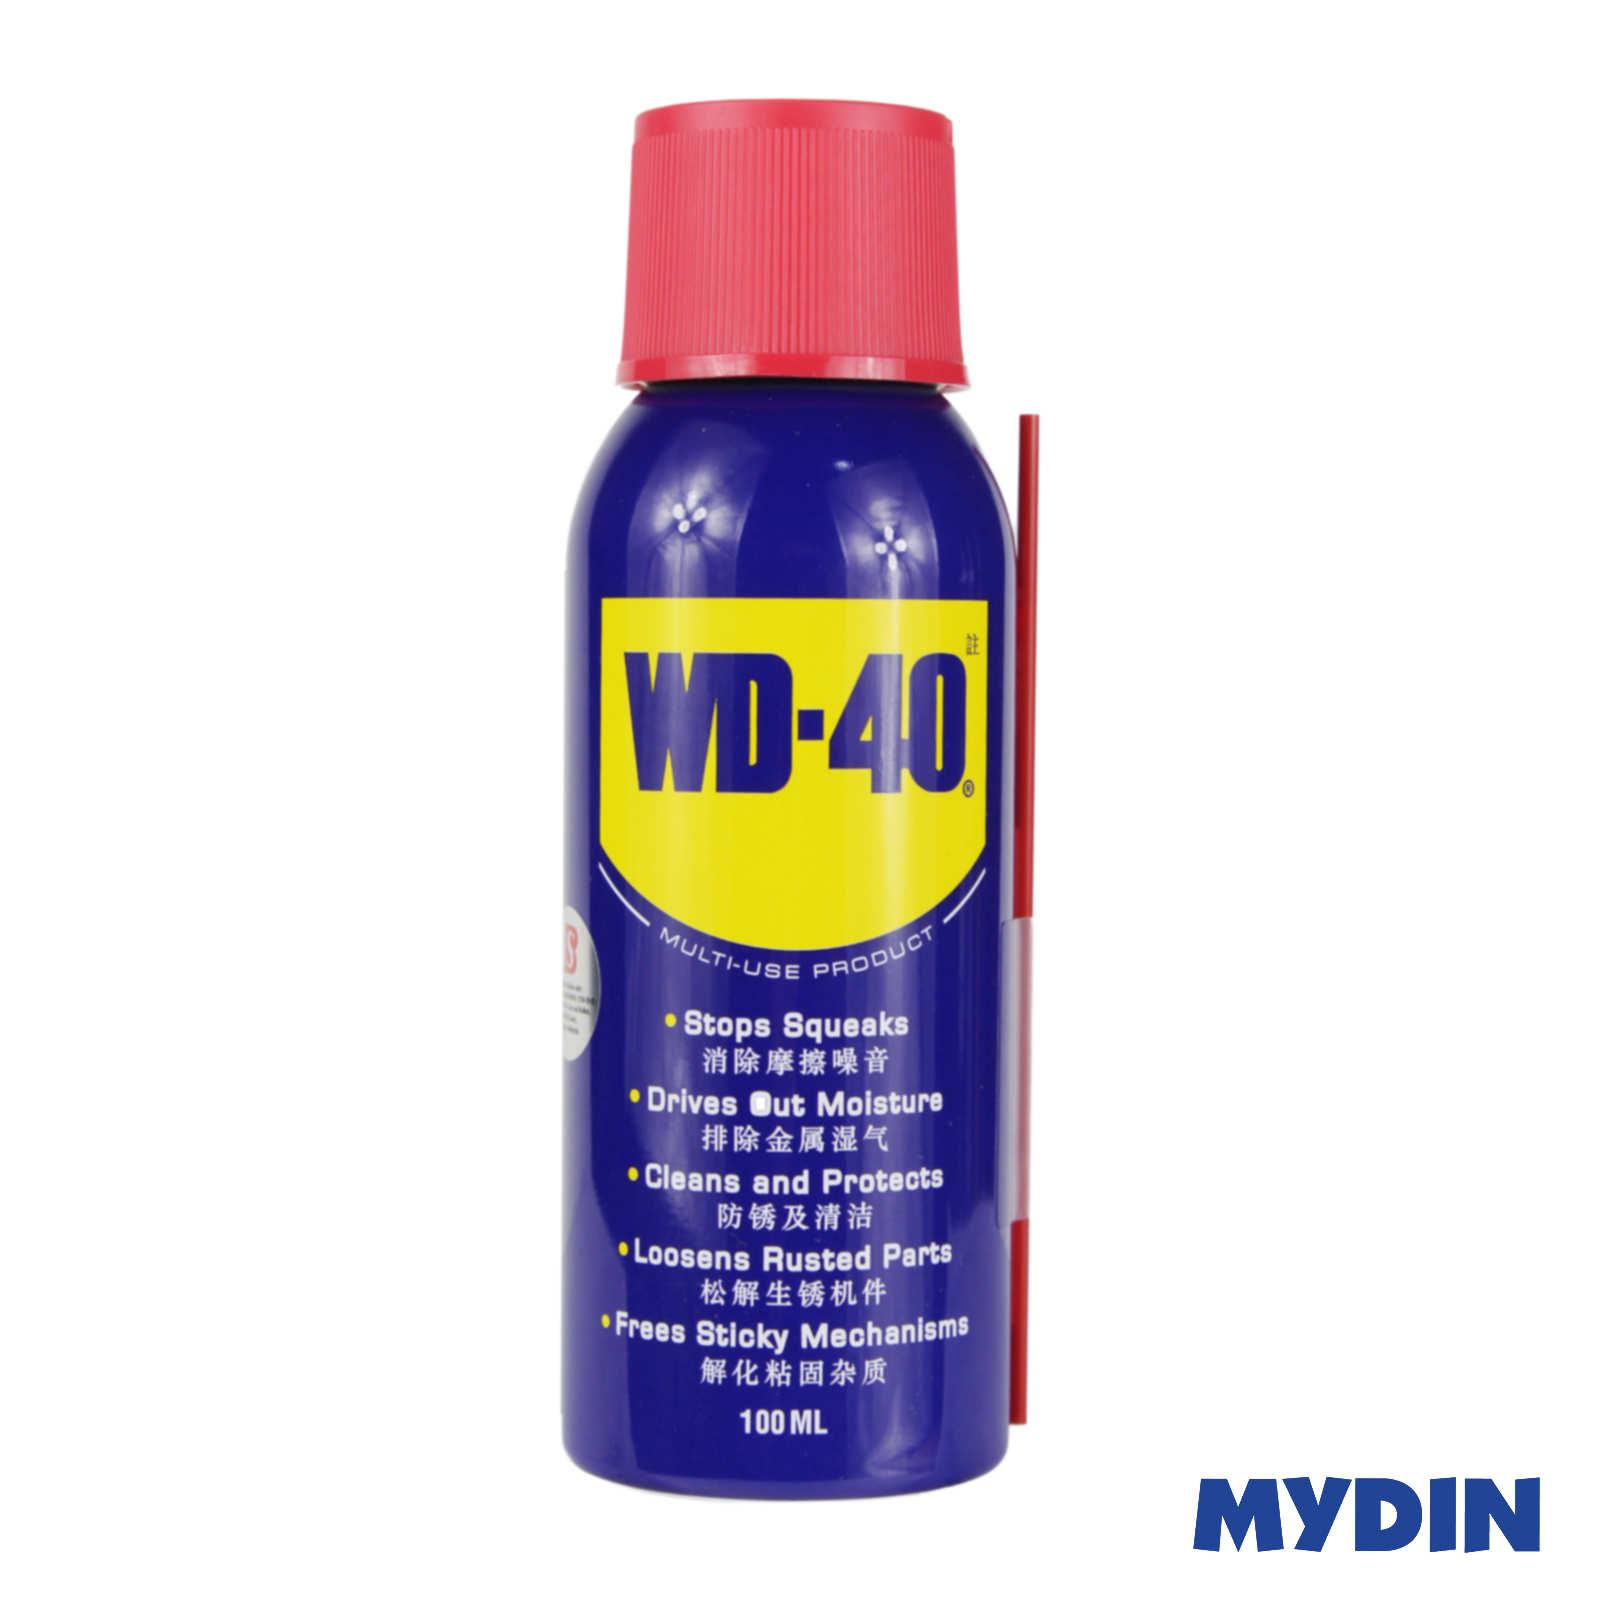 WD-40 Anti Rust Spray 100ml